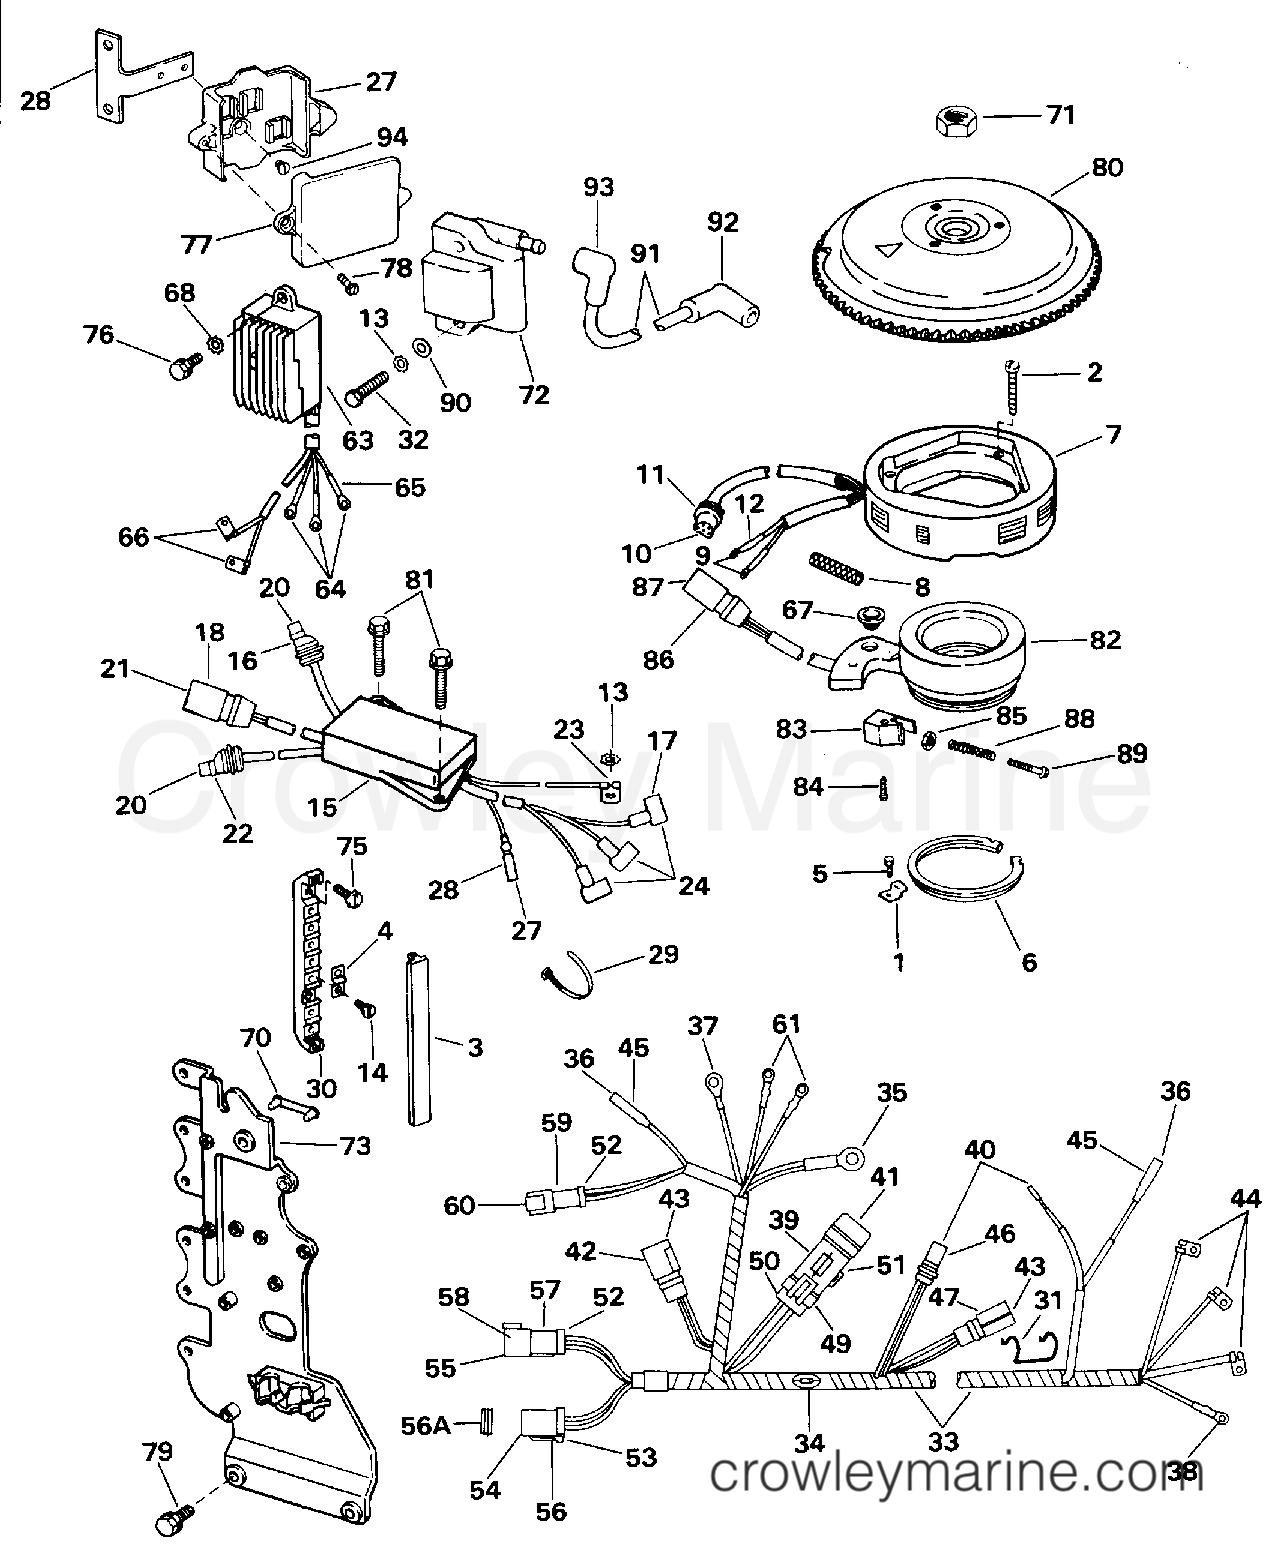 70 Hp Evinrude Wiring Diagram